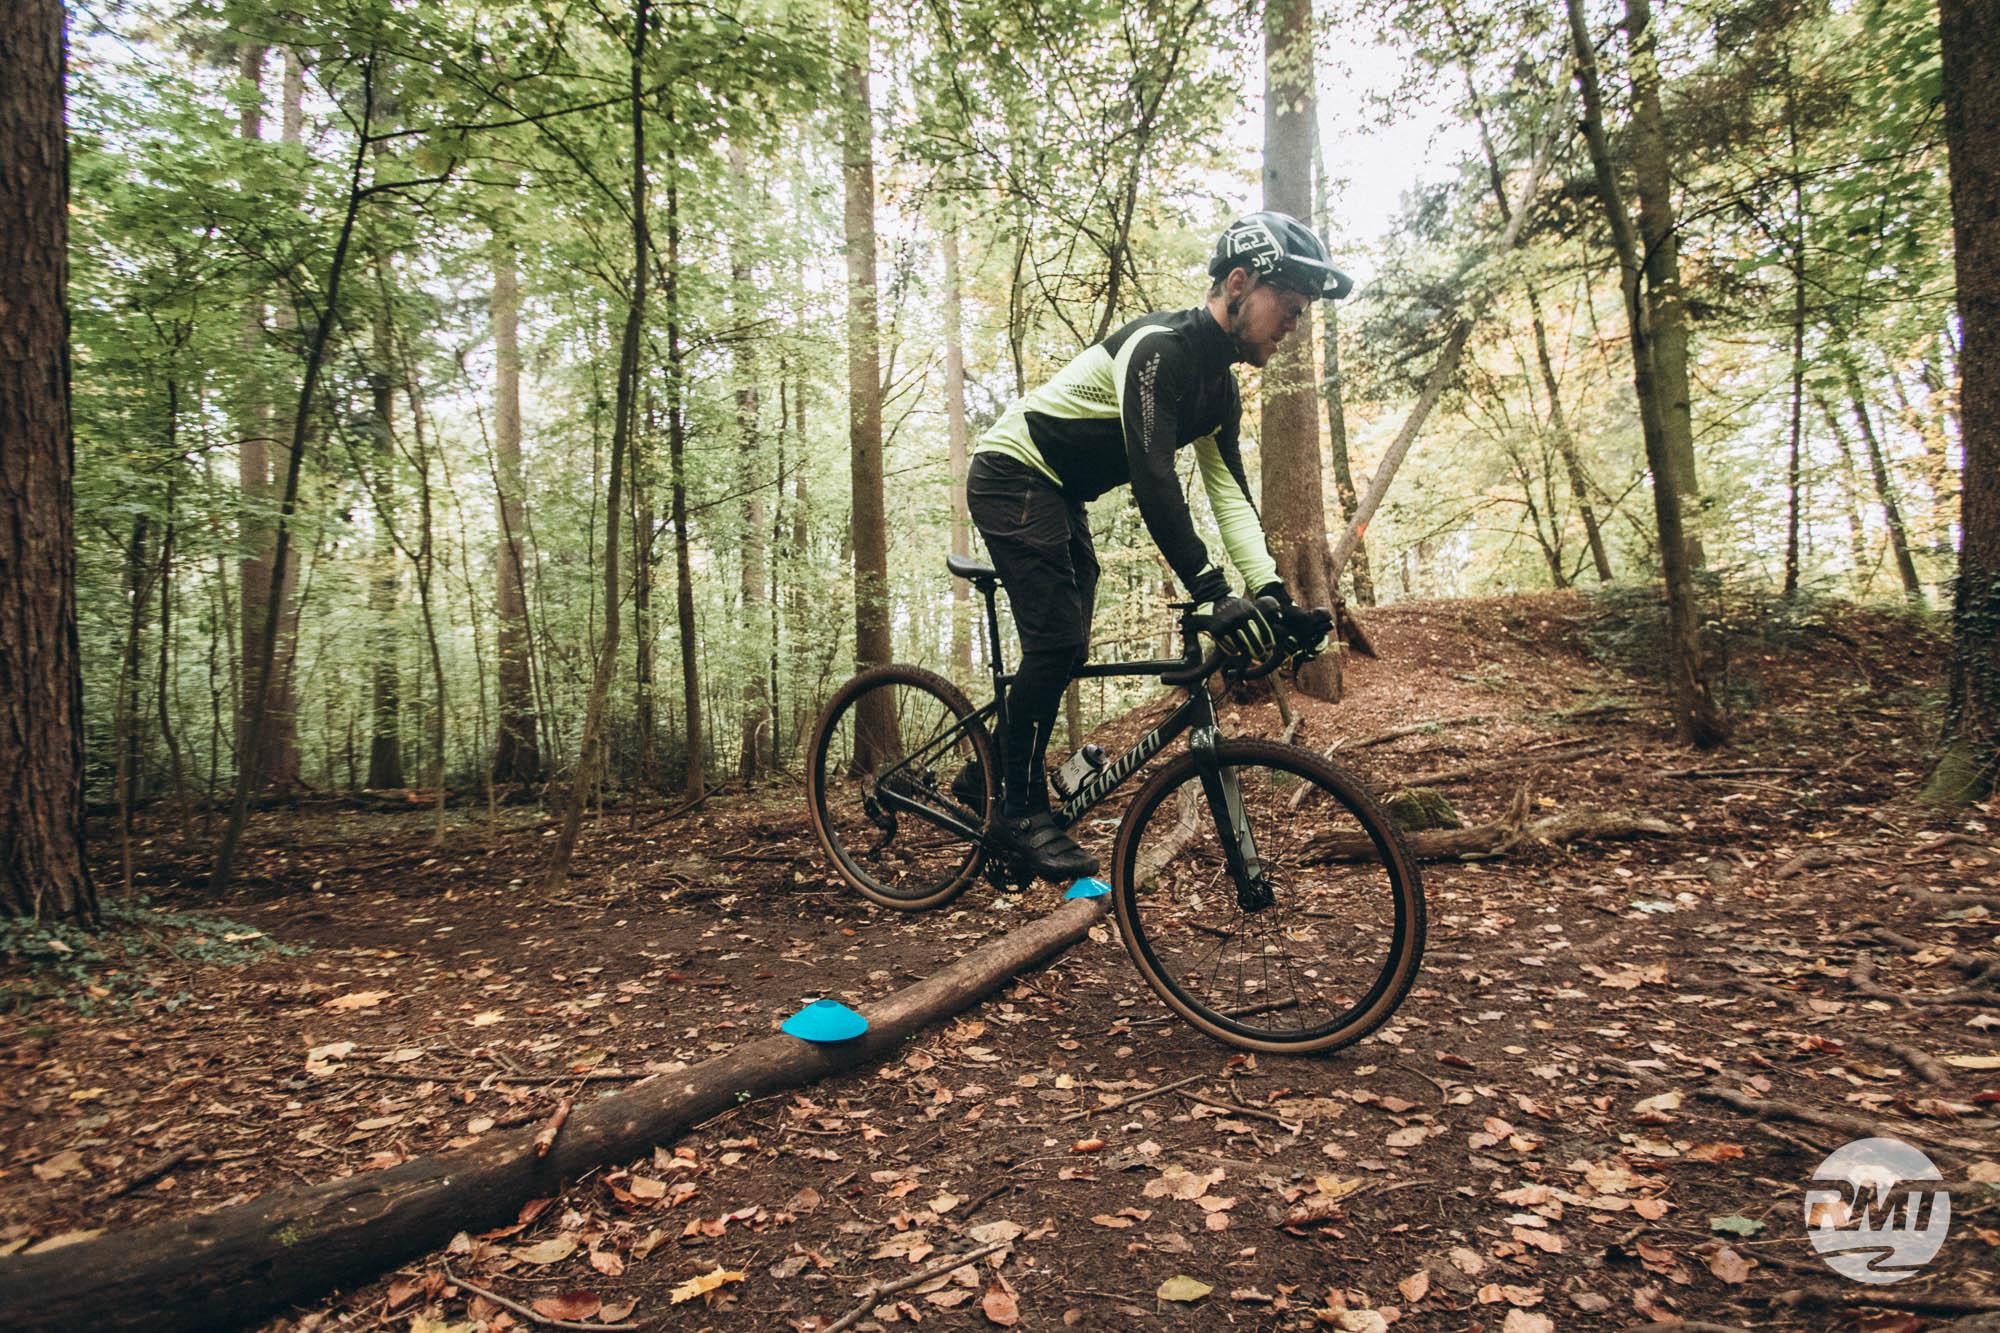 Gravel Fahrtechnik Basic Frankfurt | taunus Trails CycloCross Training Rock my Trail Bikeschule